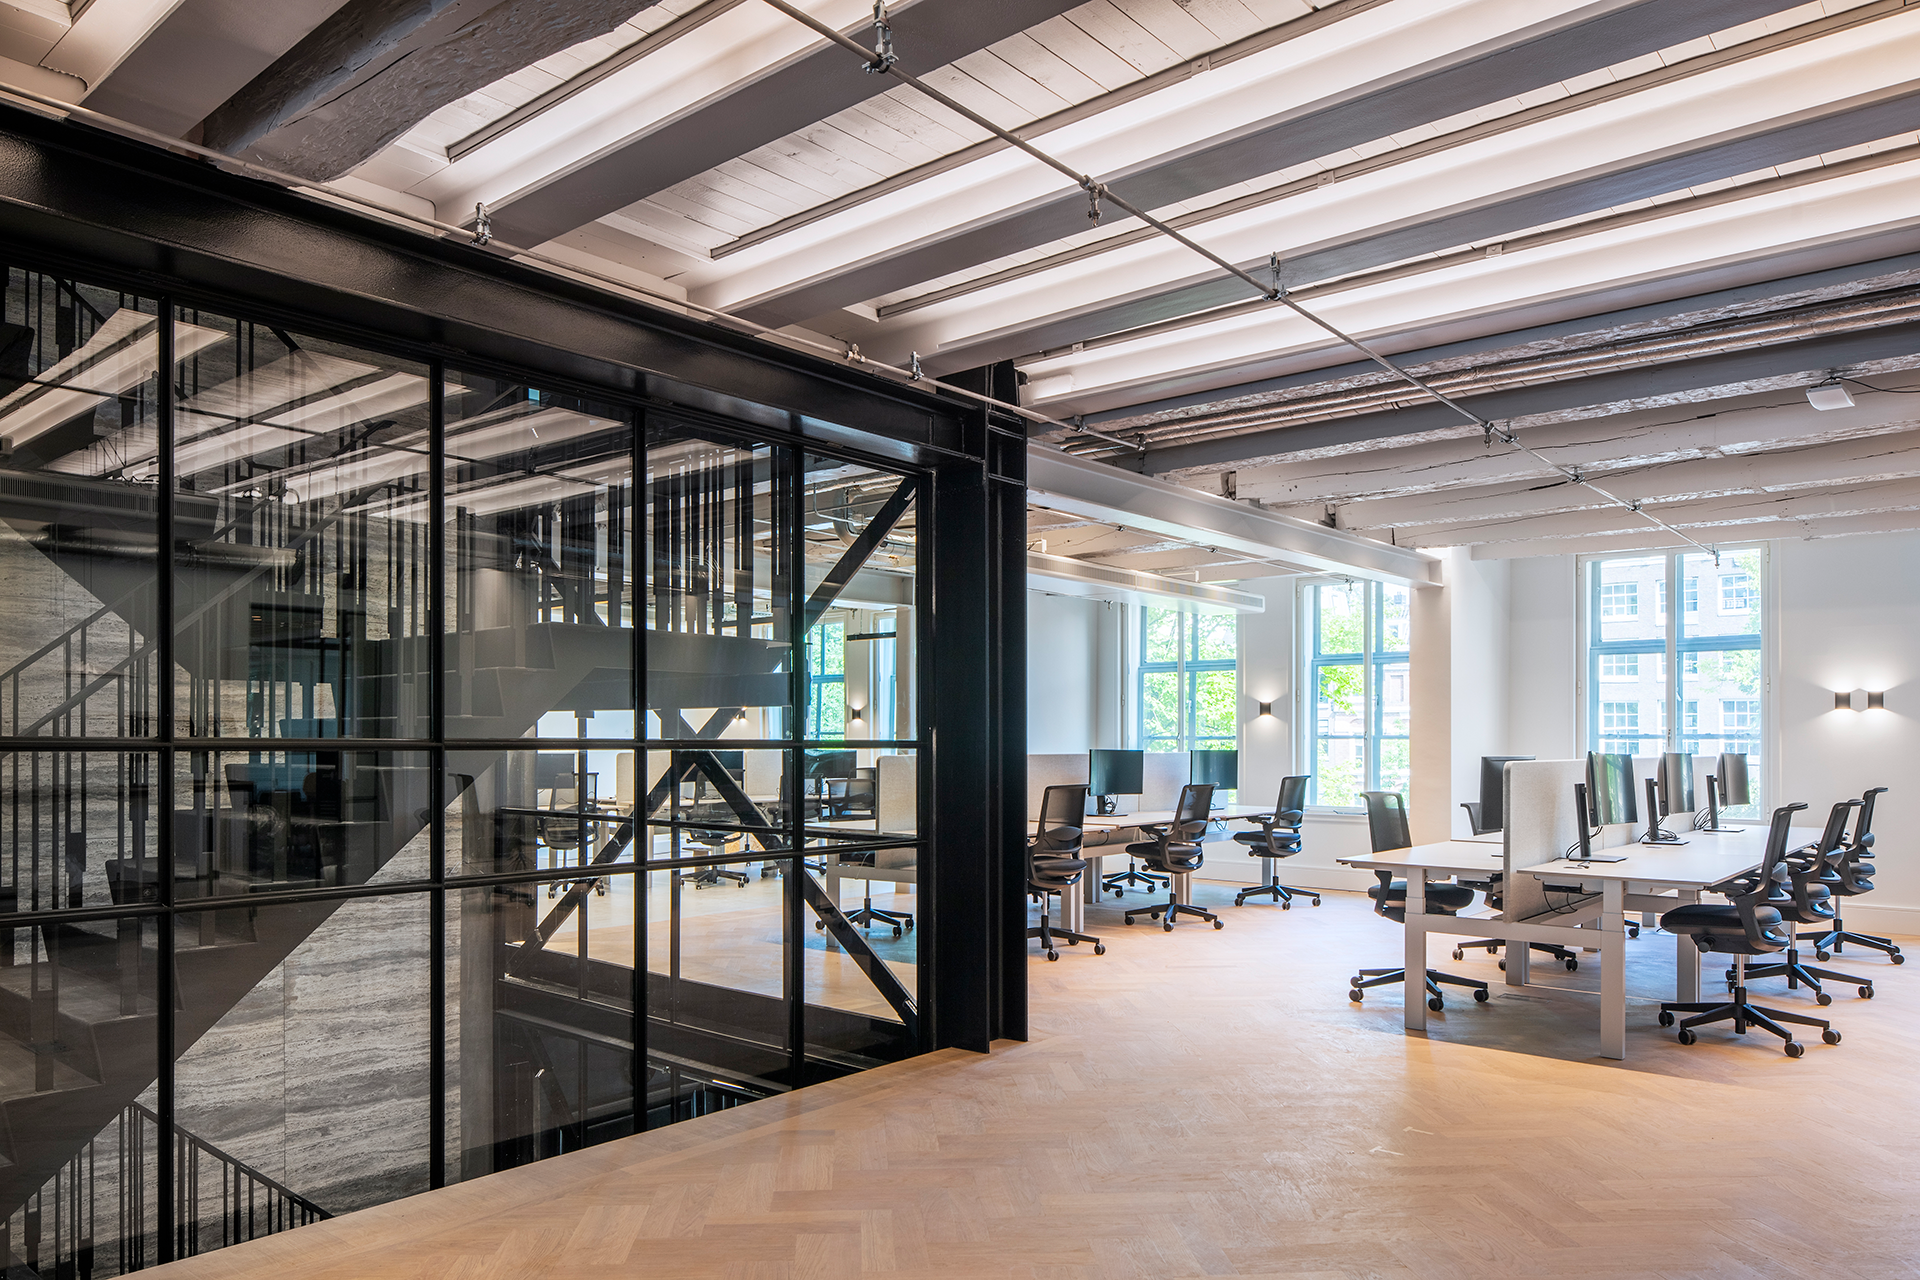 Keizersgracht super-slim steel facades